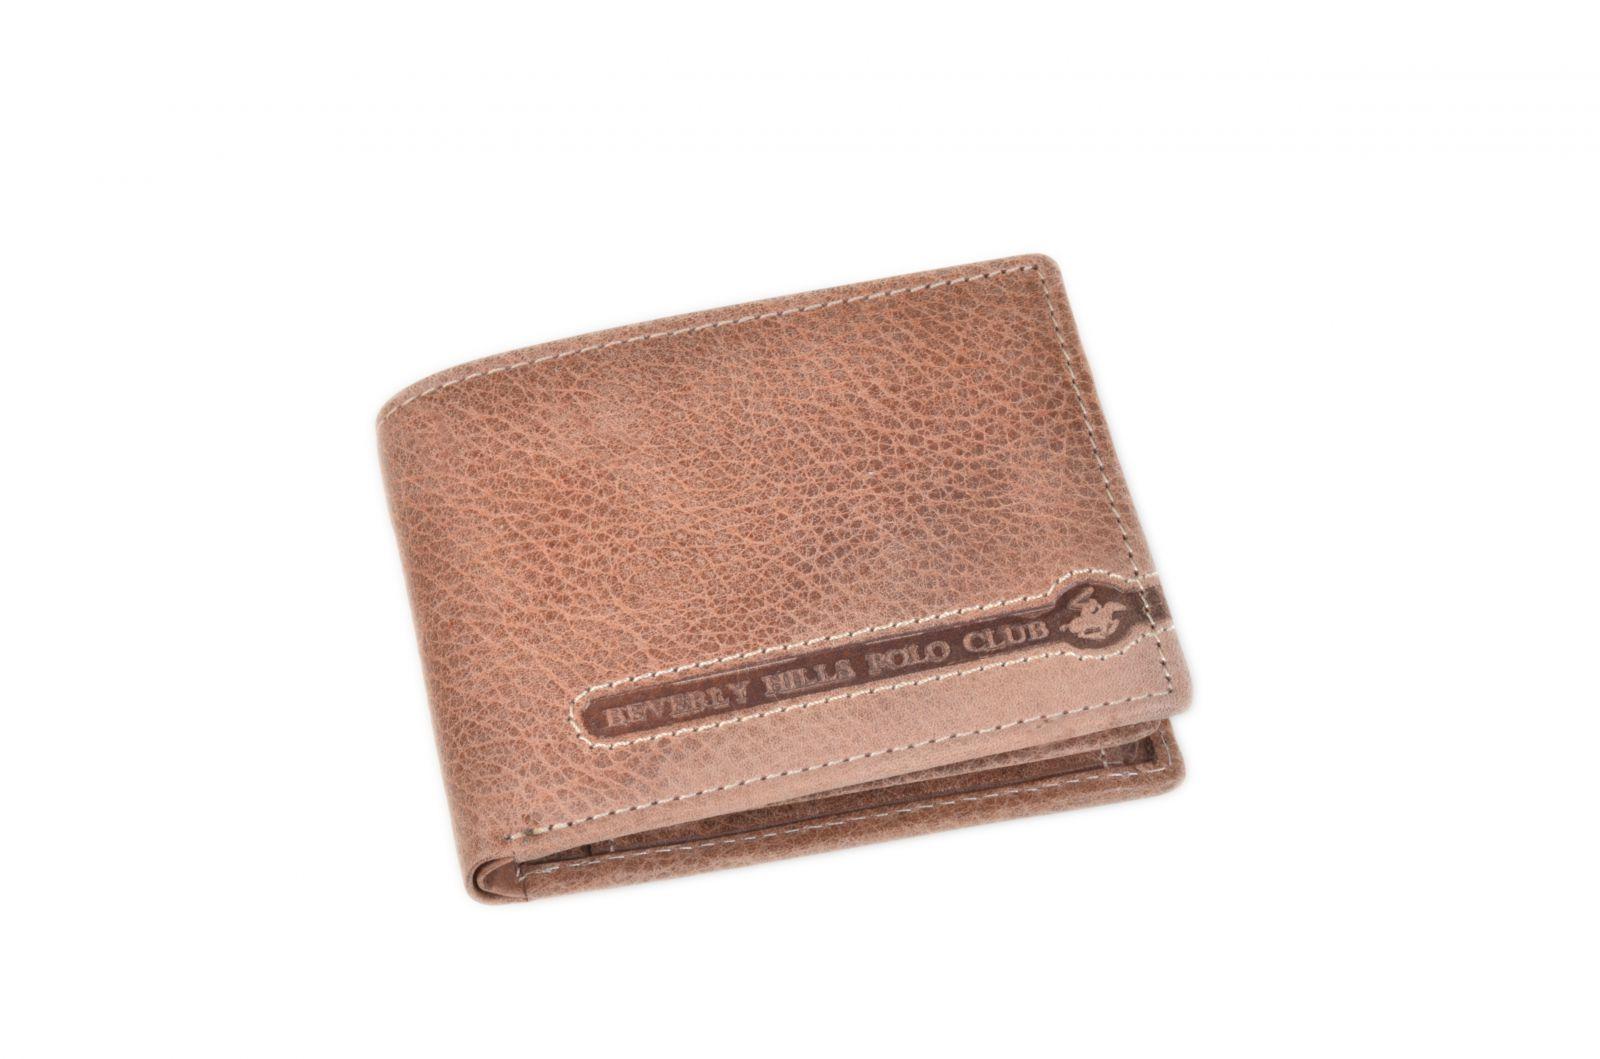 Peněženka pánská BHPC Tucson BH-394-25 hnědá v krabičce